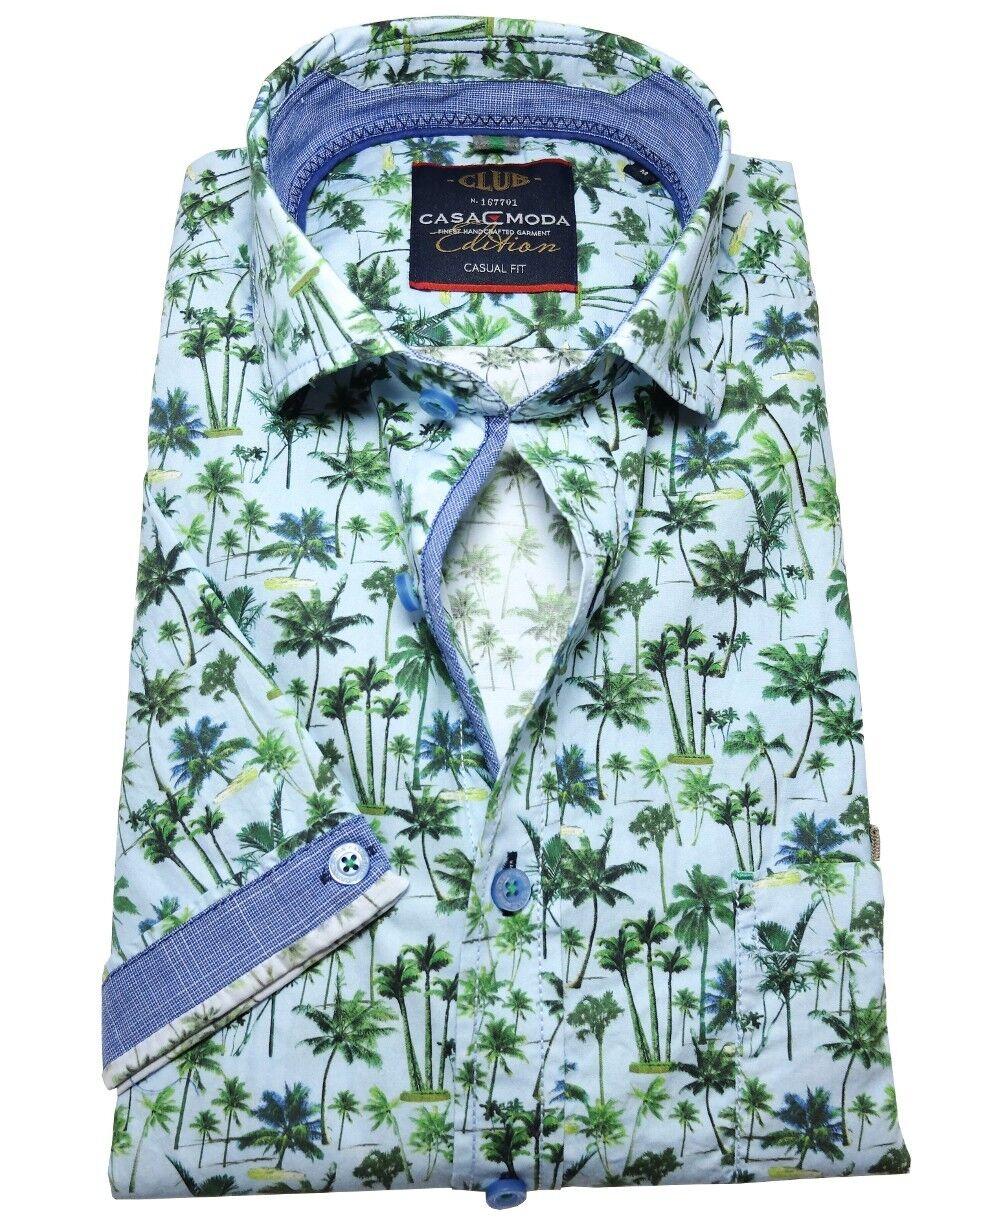 Casa Moda Casual Fit Kurzarmhemd blue green Palmendessin Gr. L und 5XL